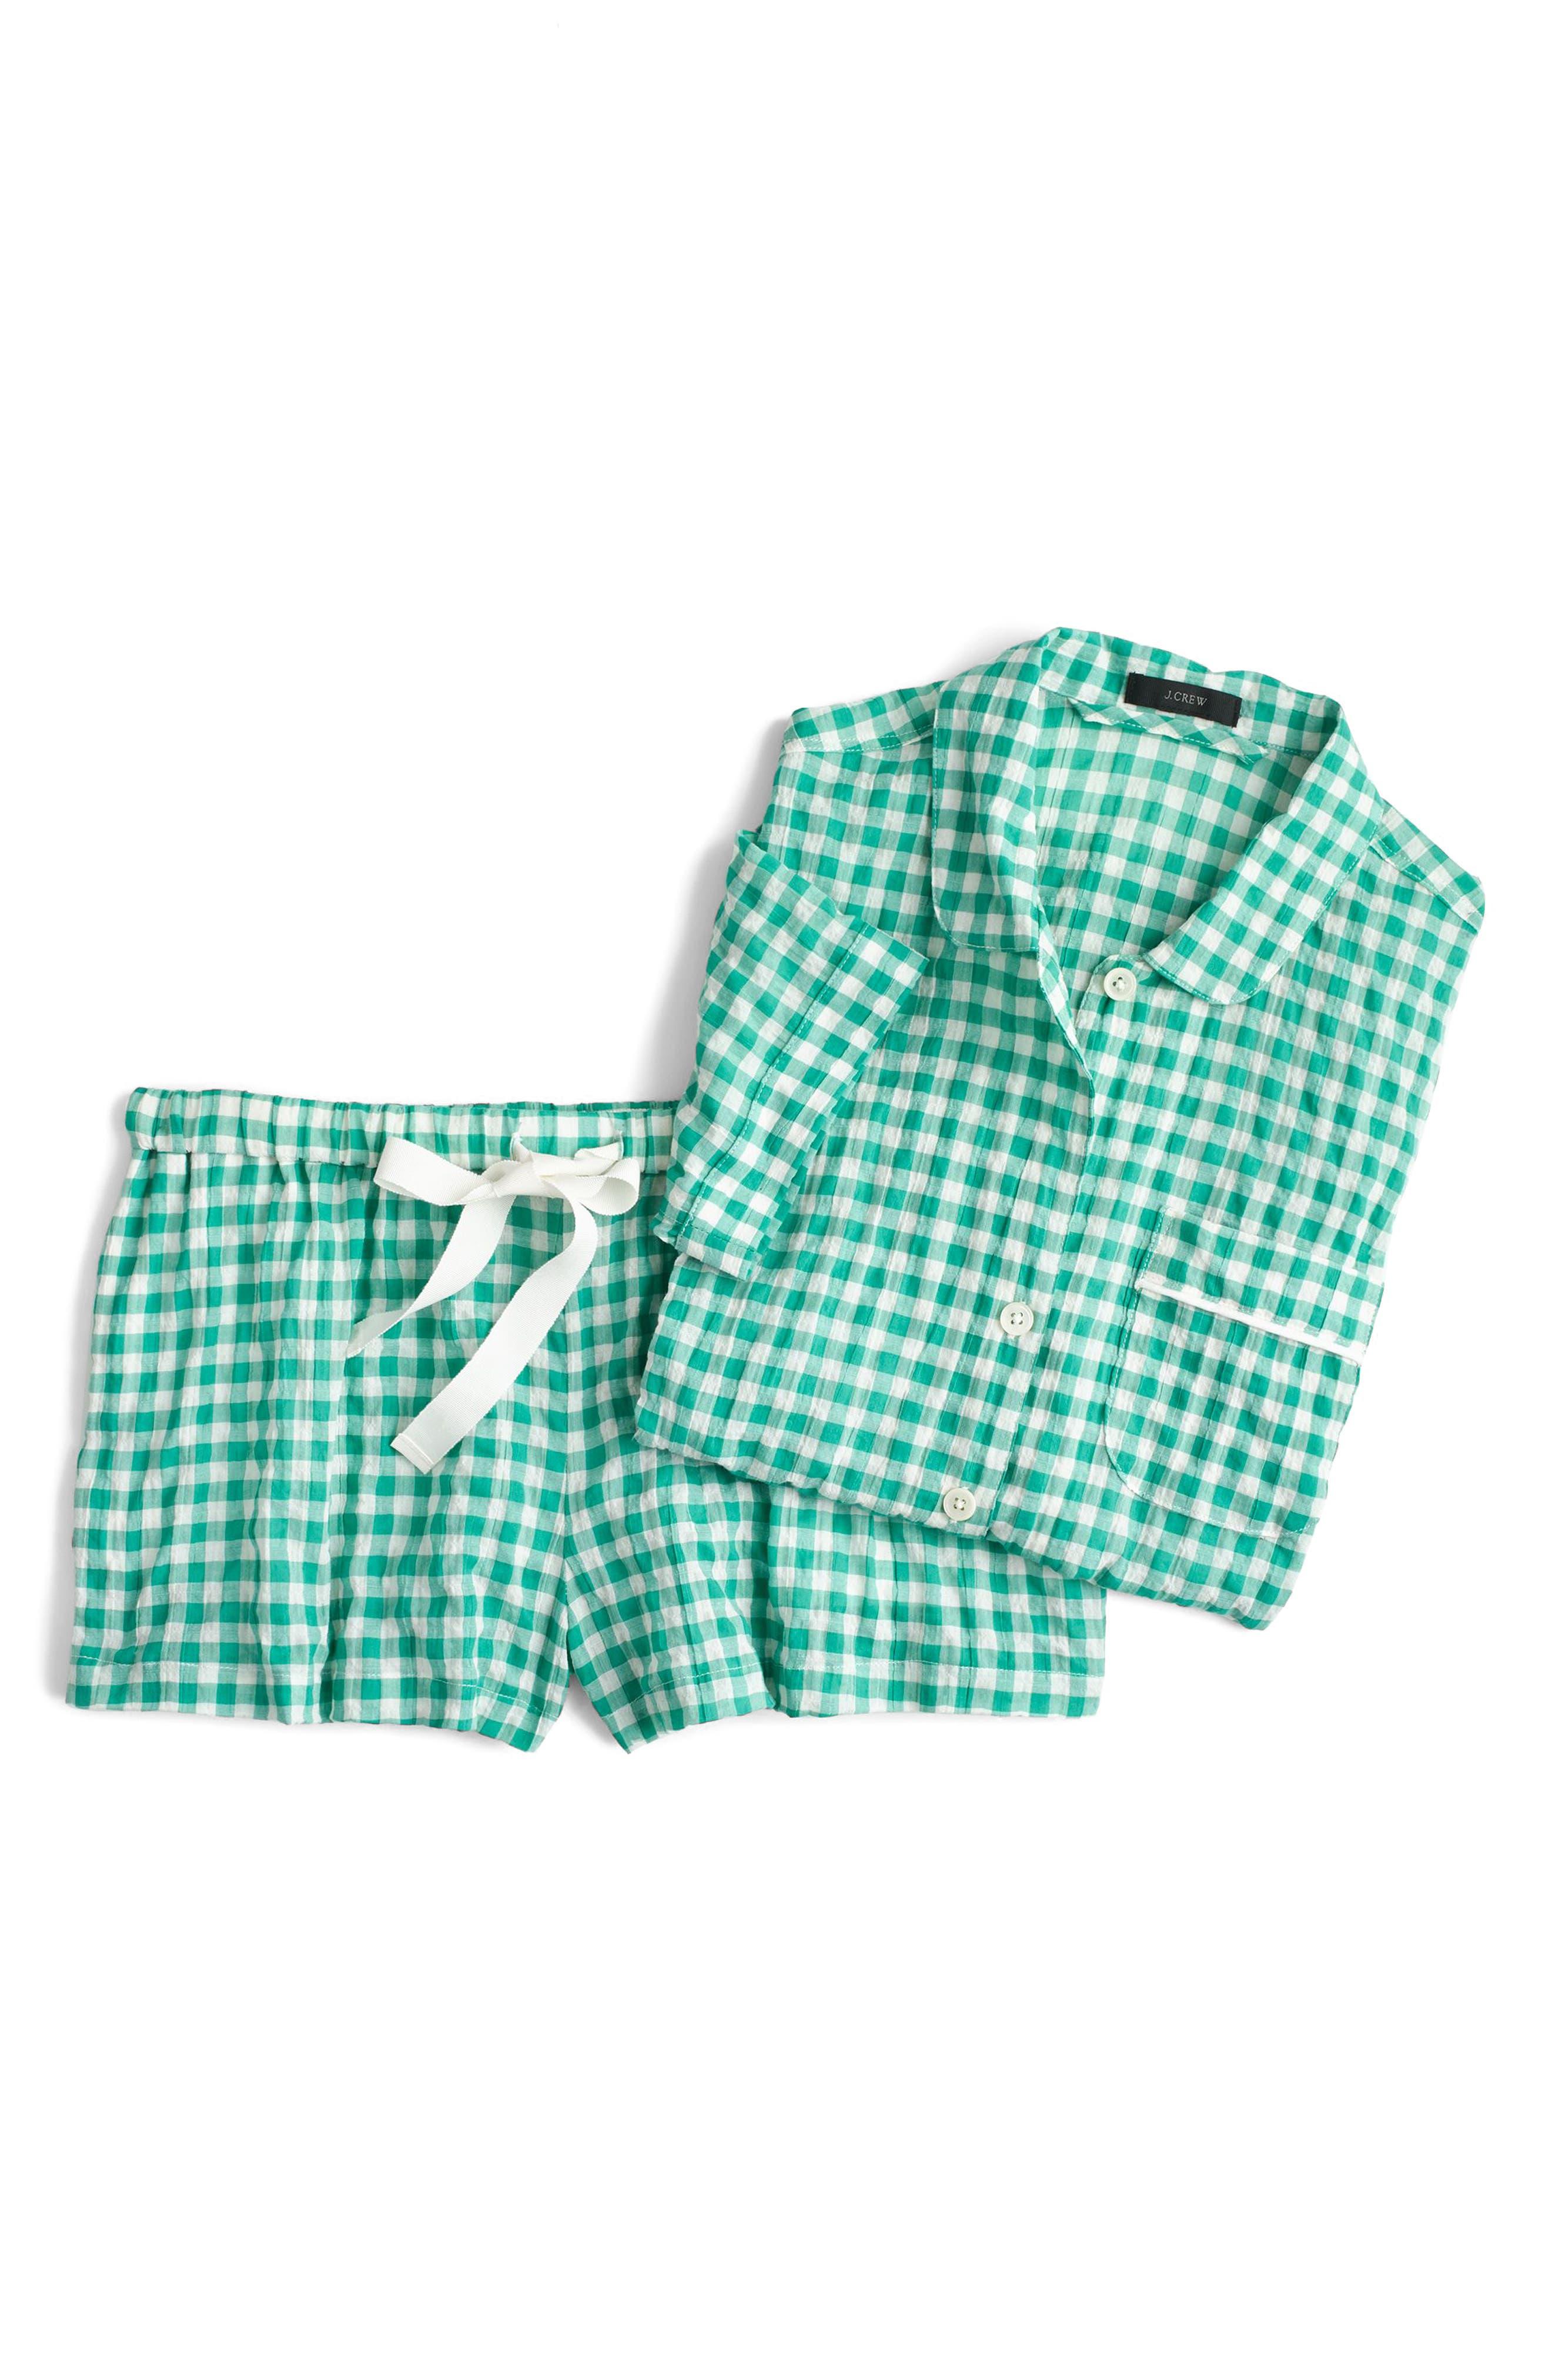 J.Crew Gingham Pajama Set,                             Main thumbnail 1, color,                             Ivory Green